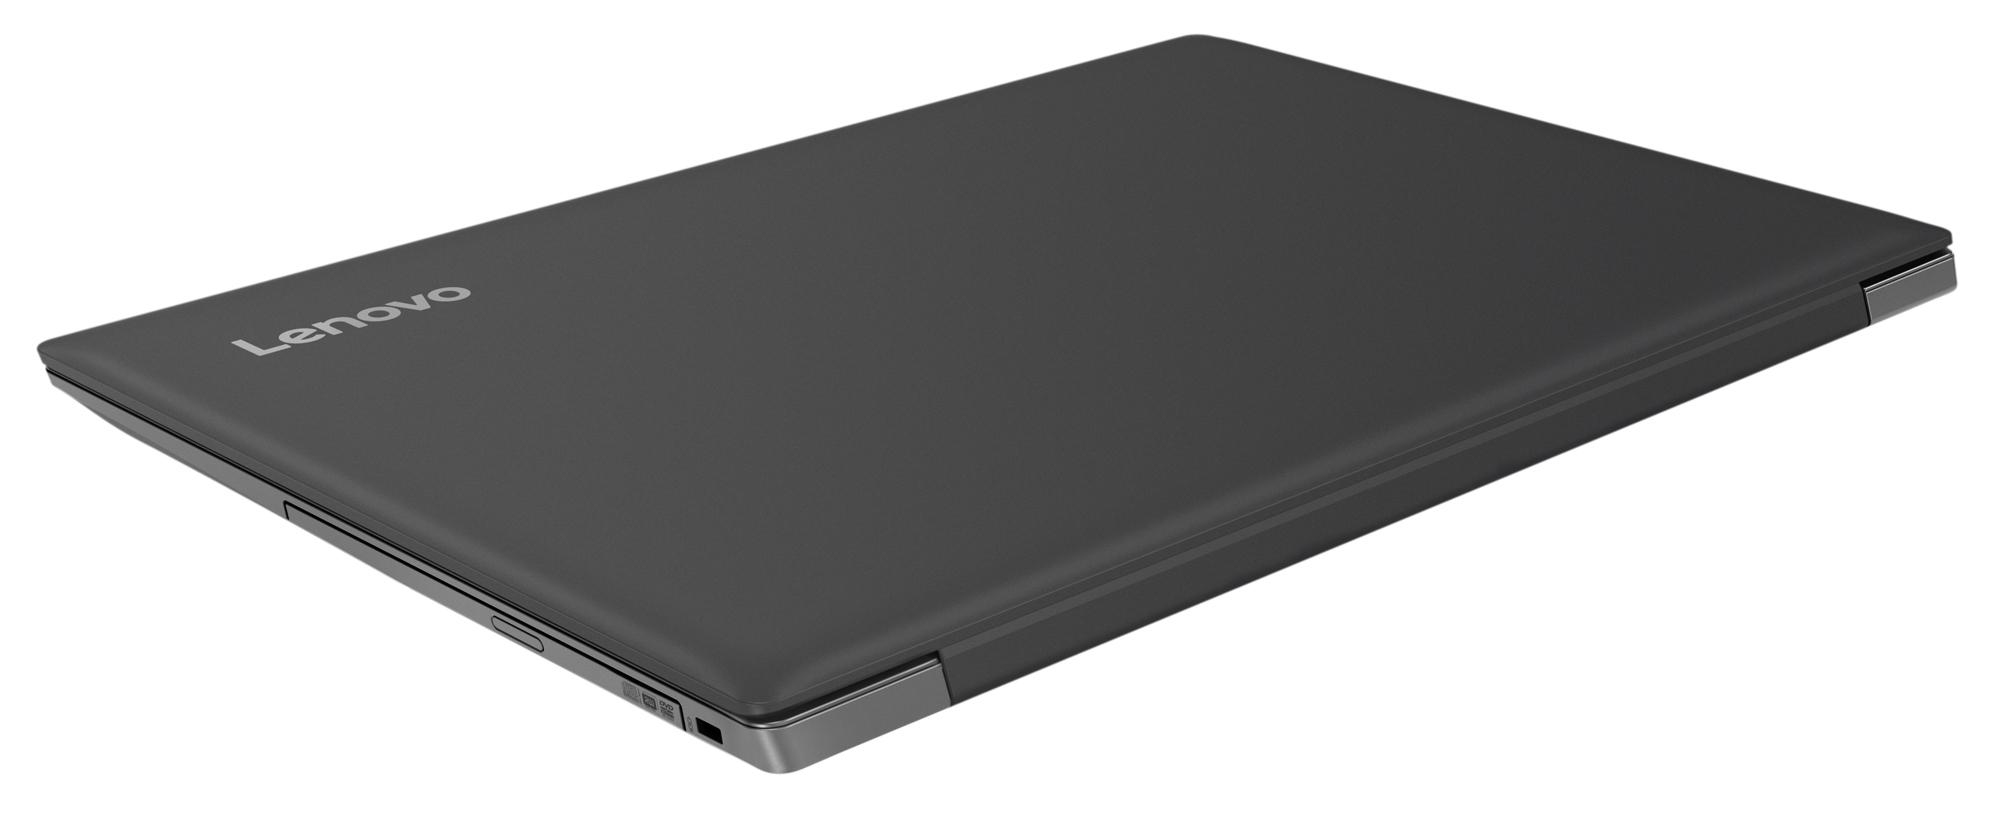 Фото  Ноутбук Lenovo ideapad 330-15 Onyx Black (81DC0123RA)